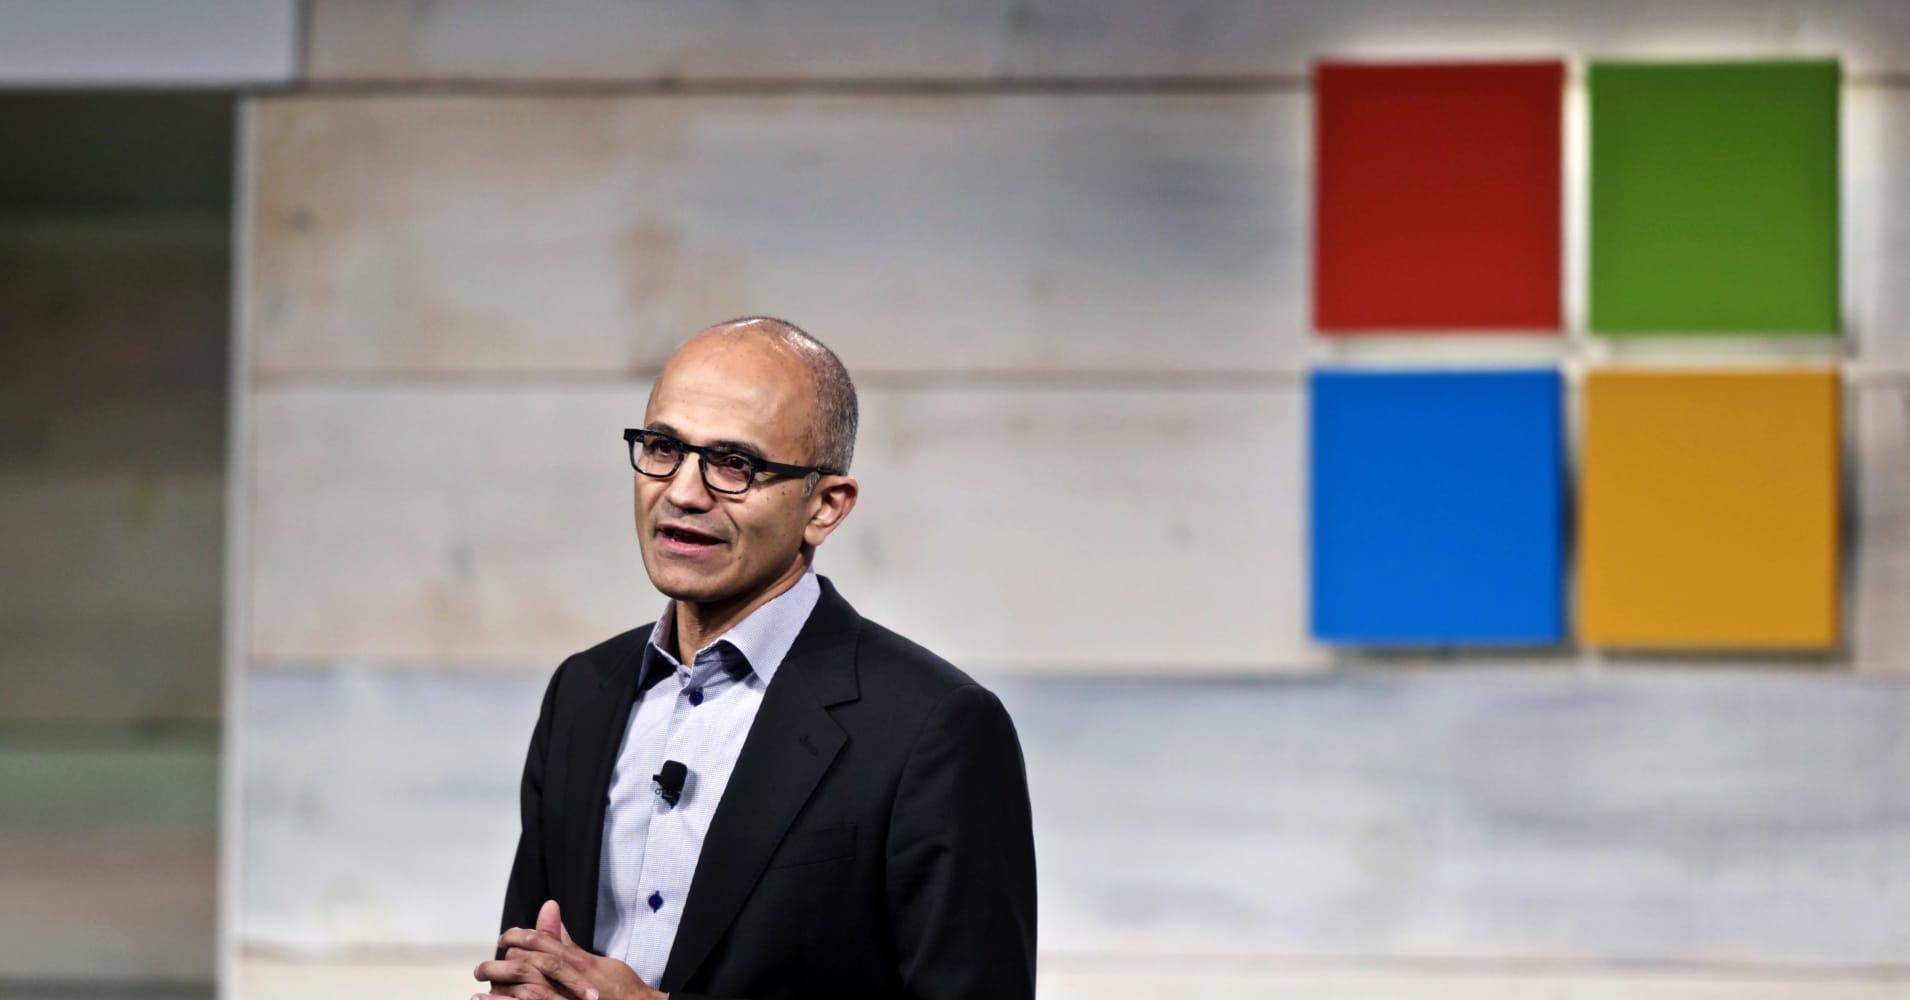 Microsoft just passed a huge cloud milestone